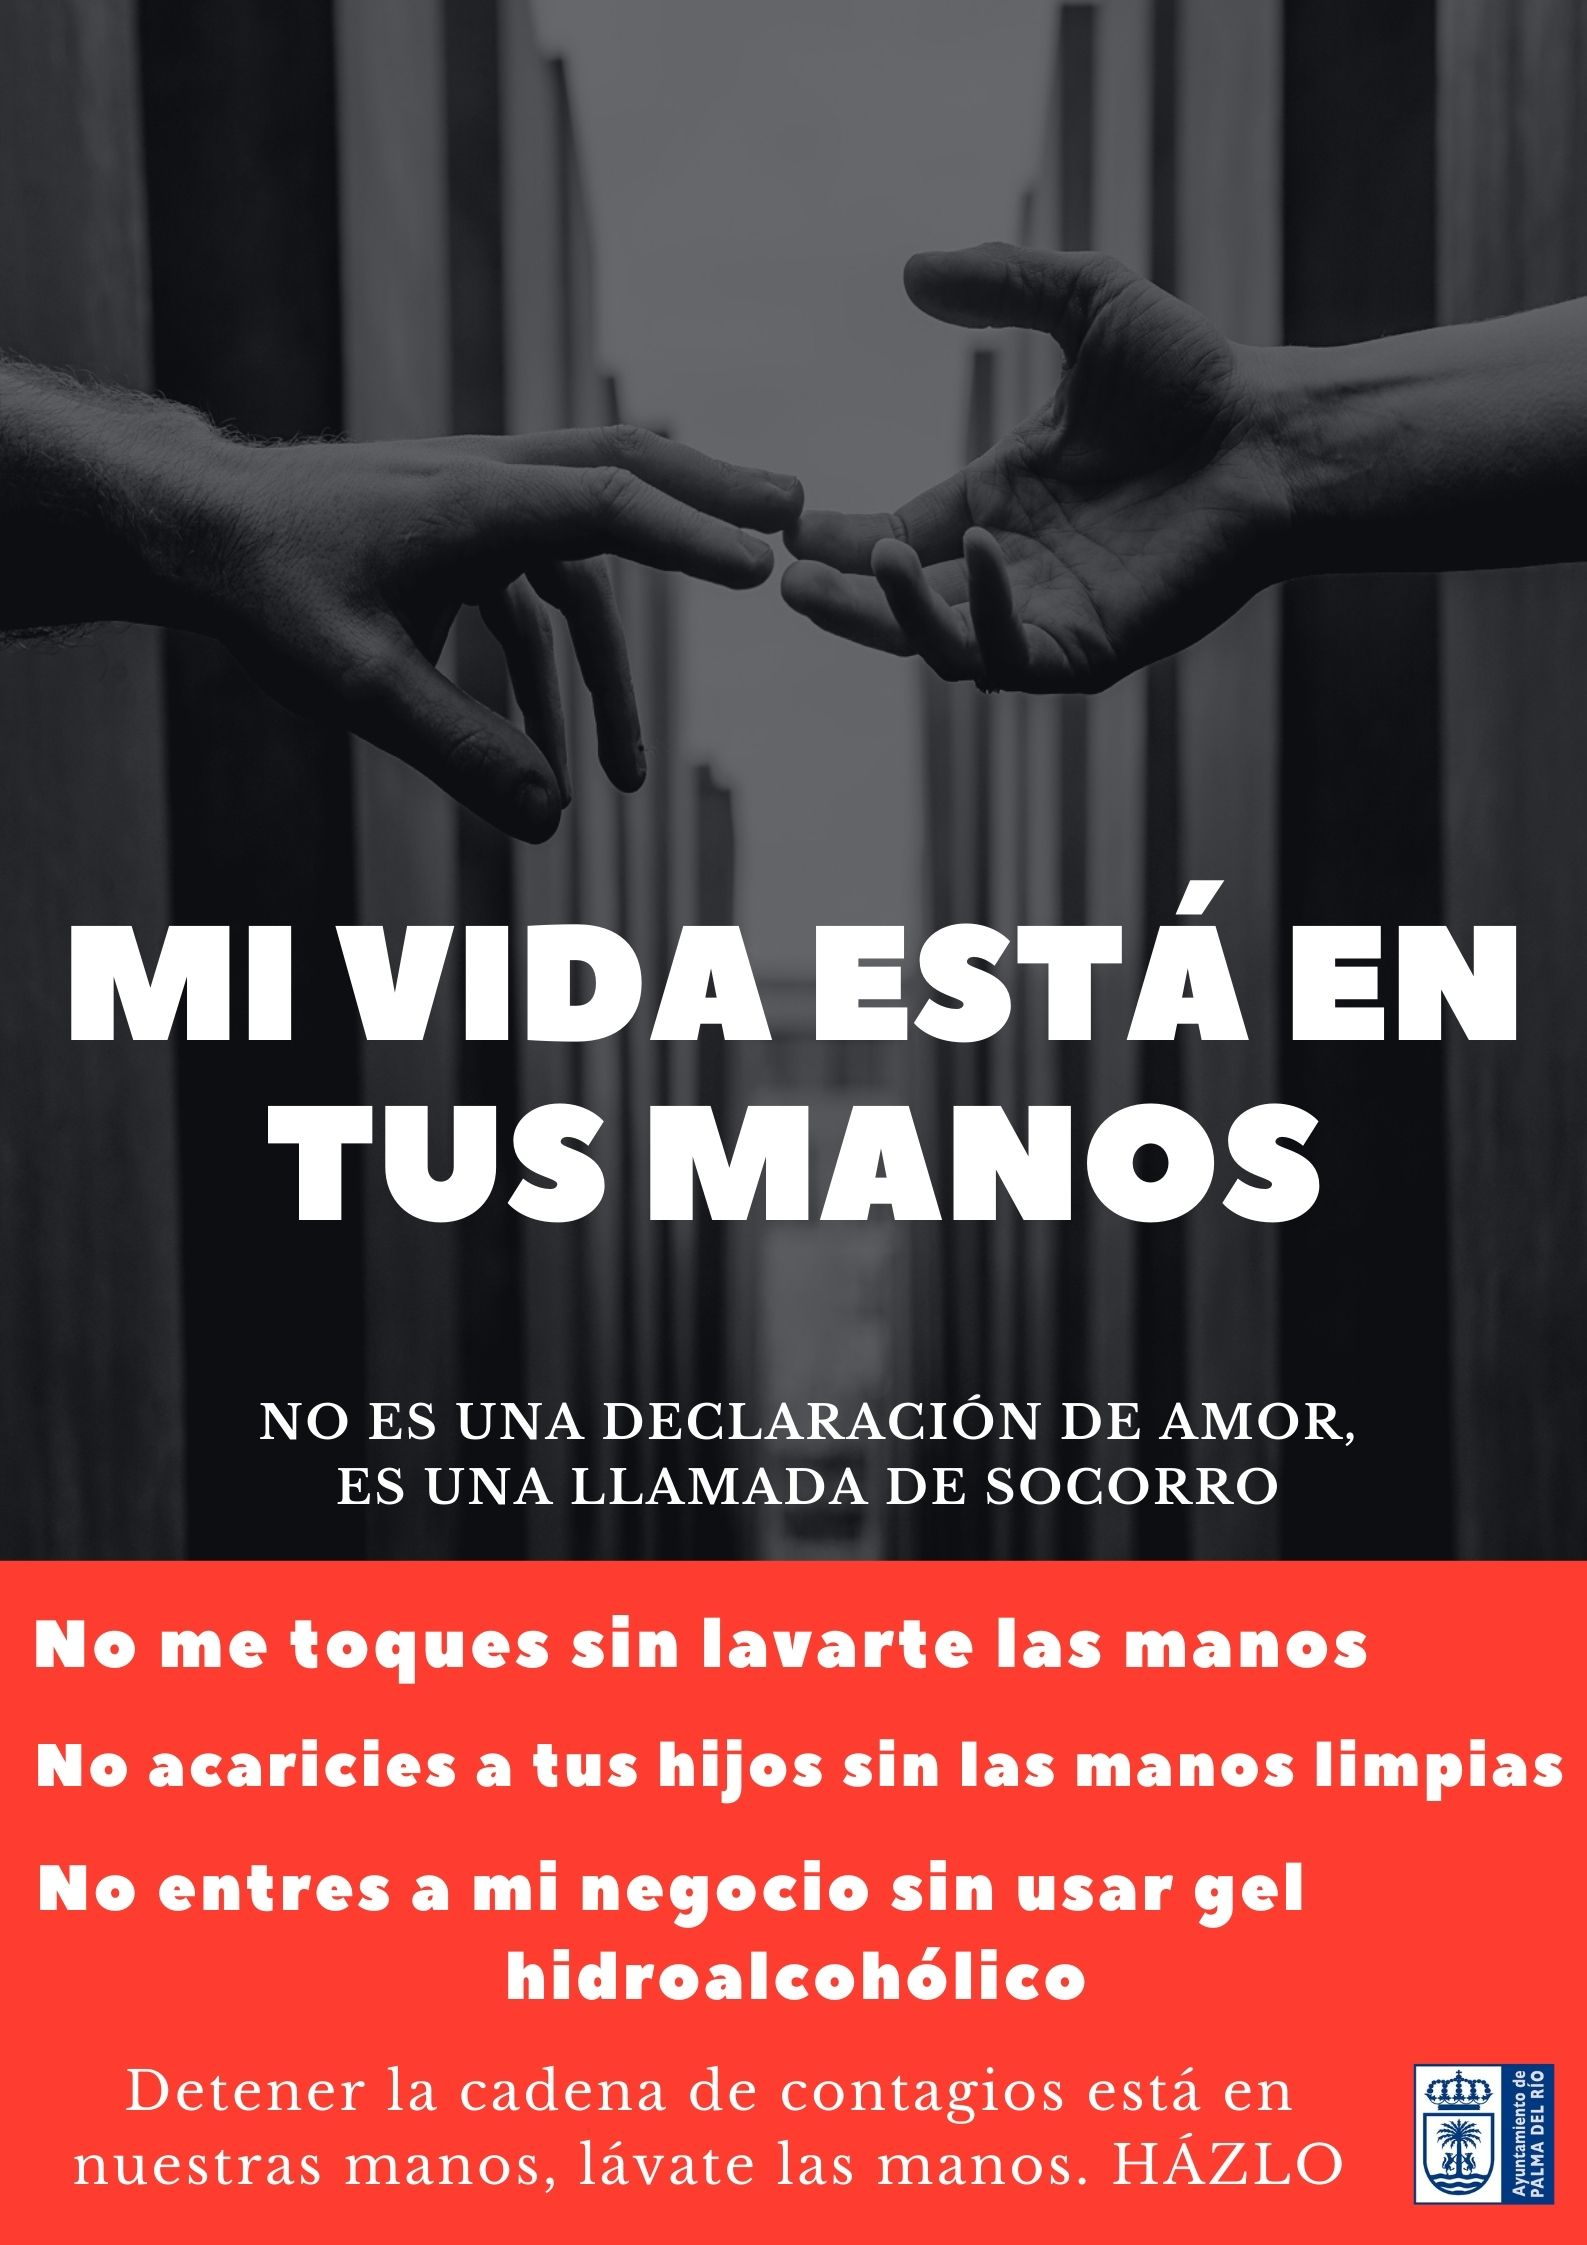 https://www.palmadelrio.es/sites/default/files/lavado_manos_0.jpg